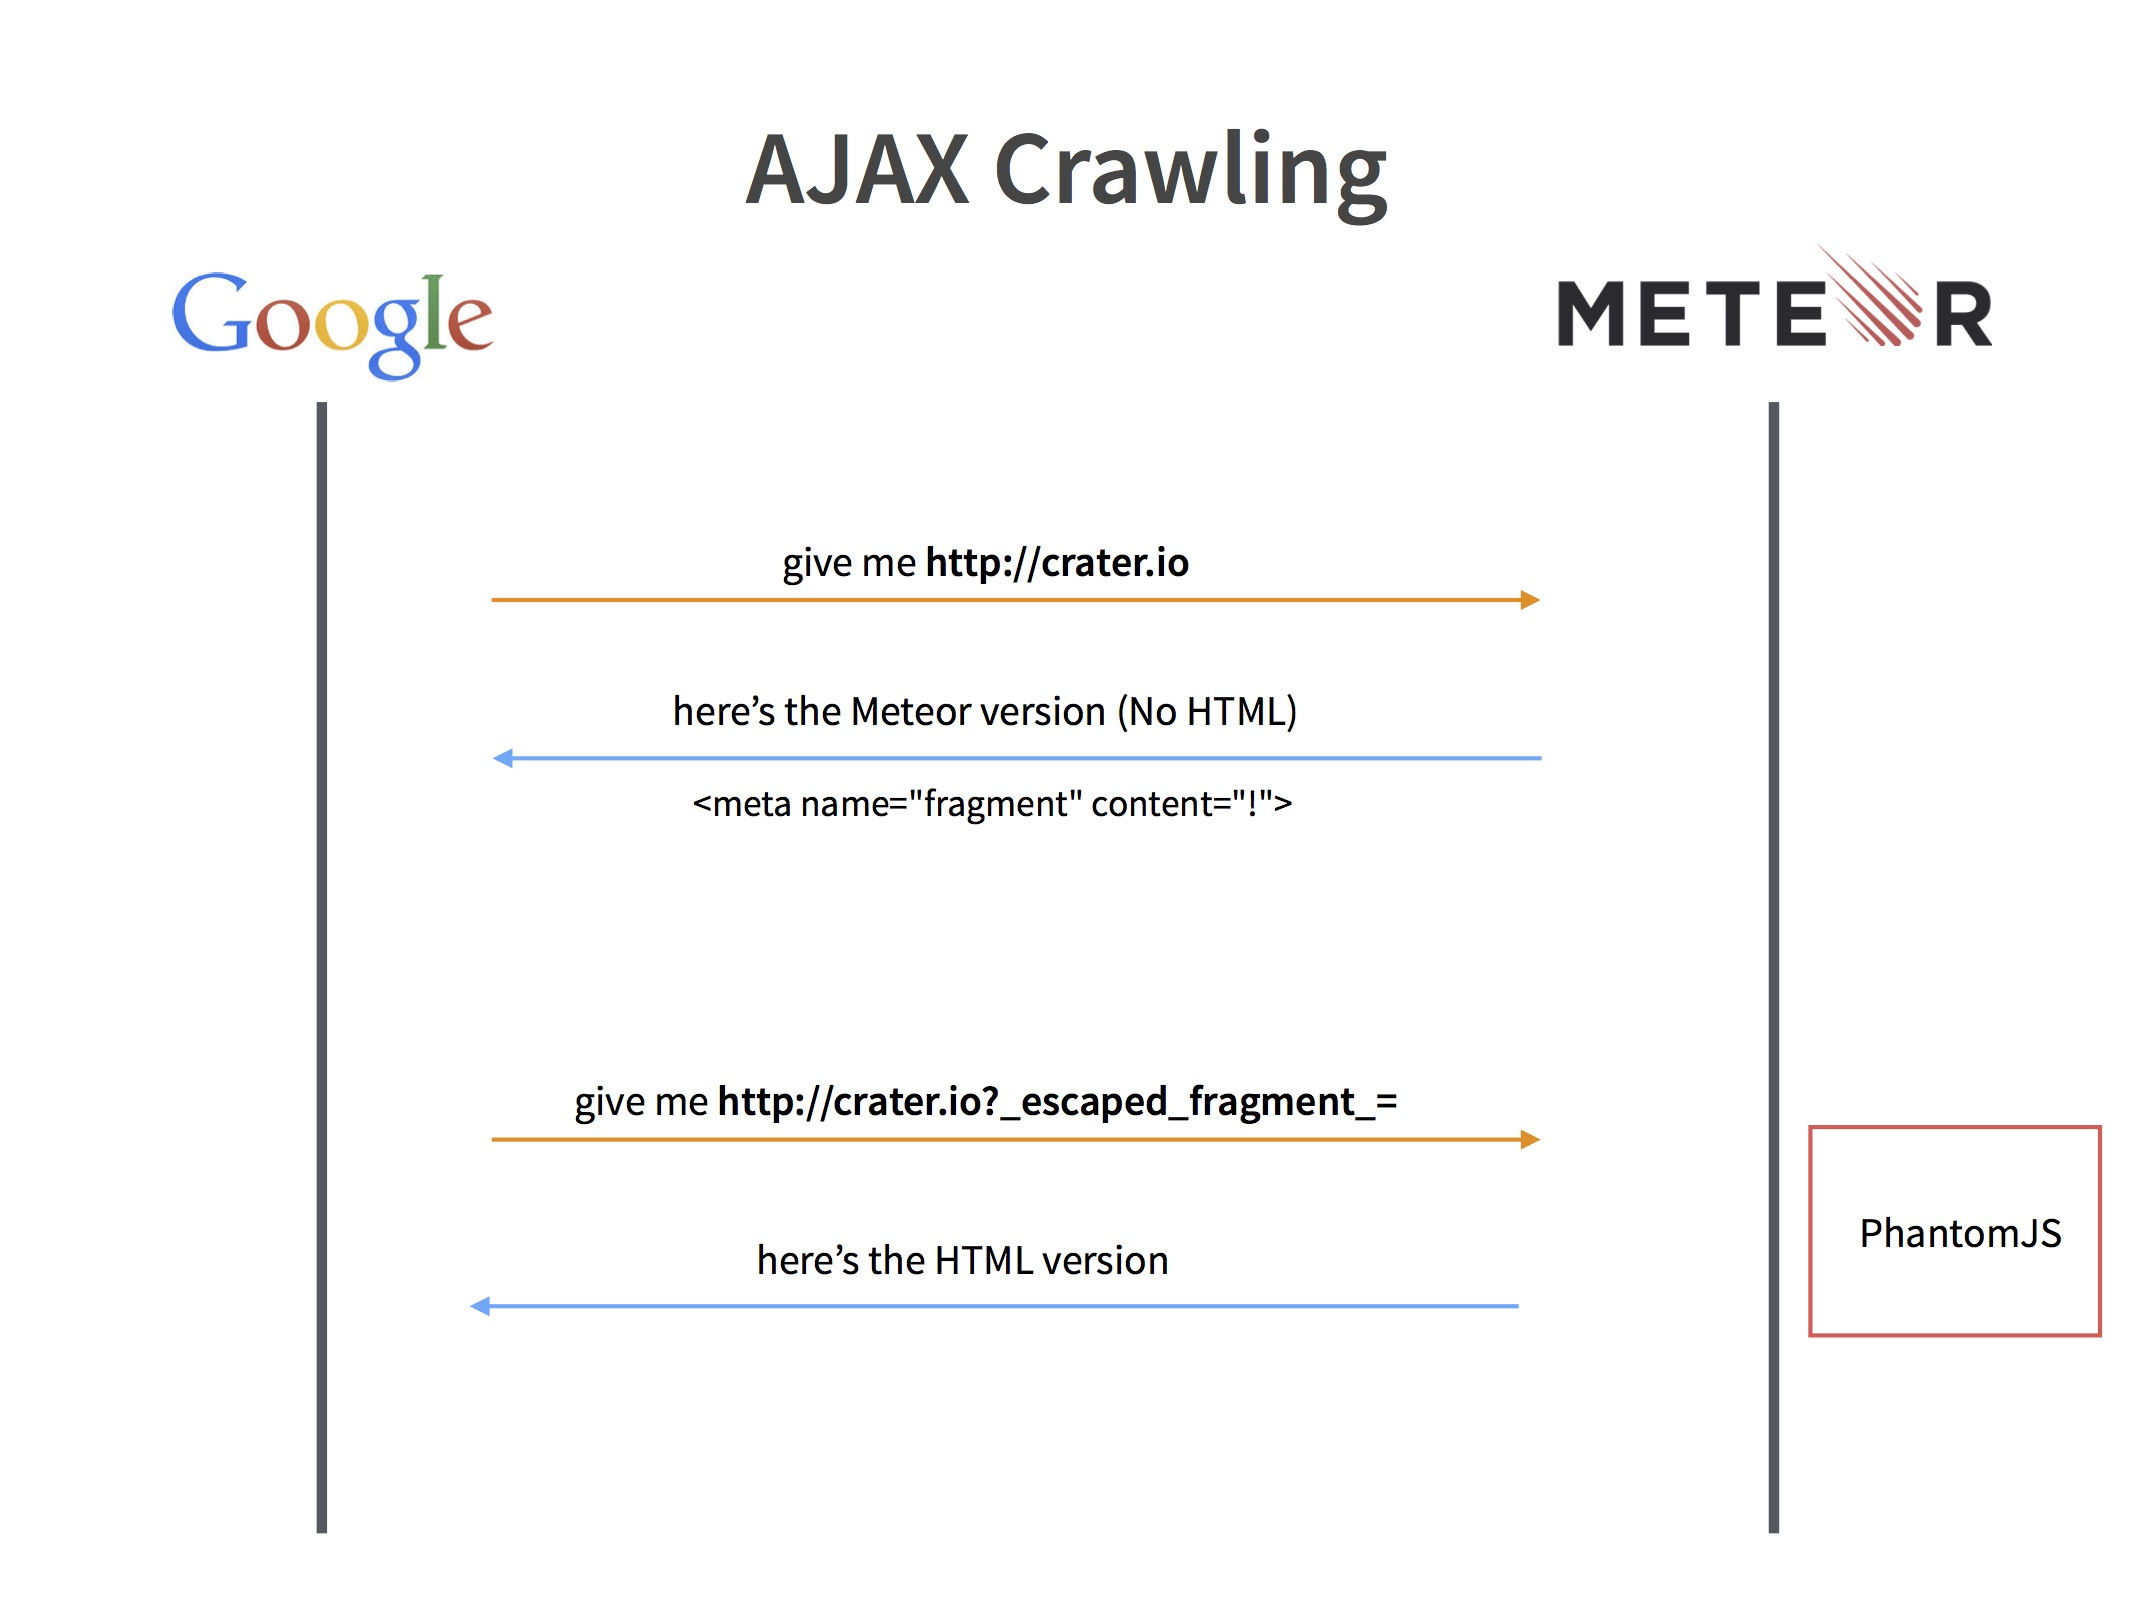 Meteor's AJAX Crawling